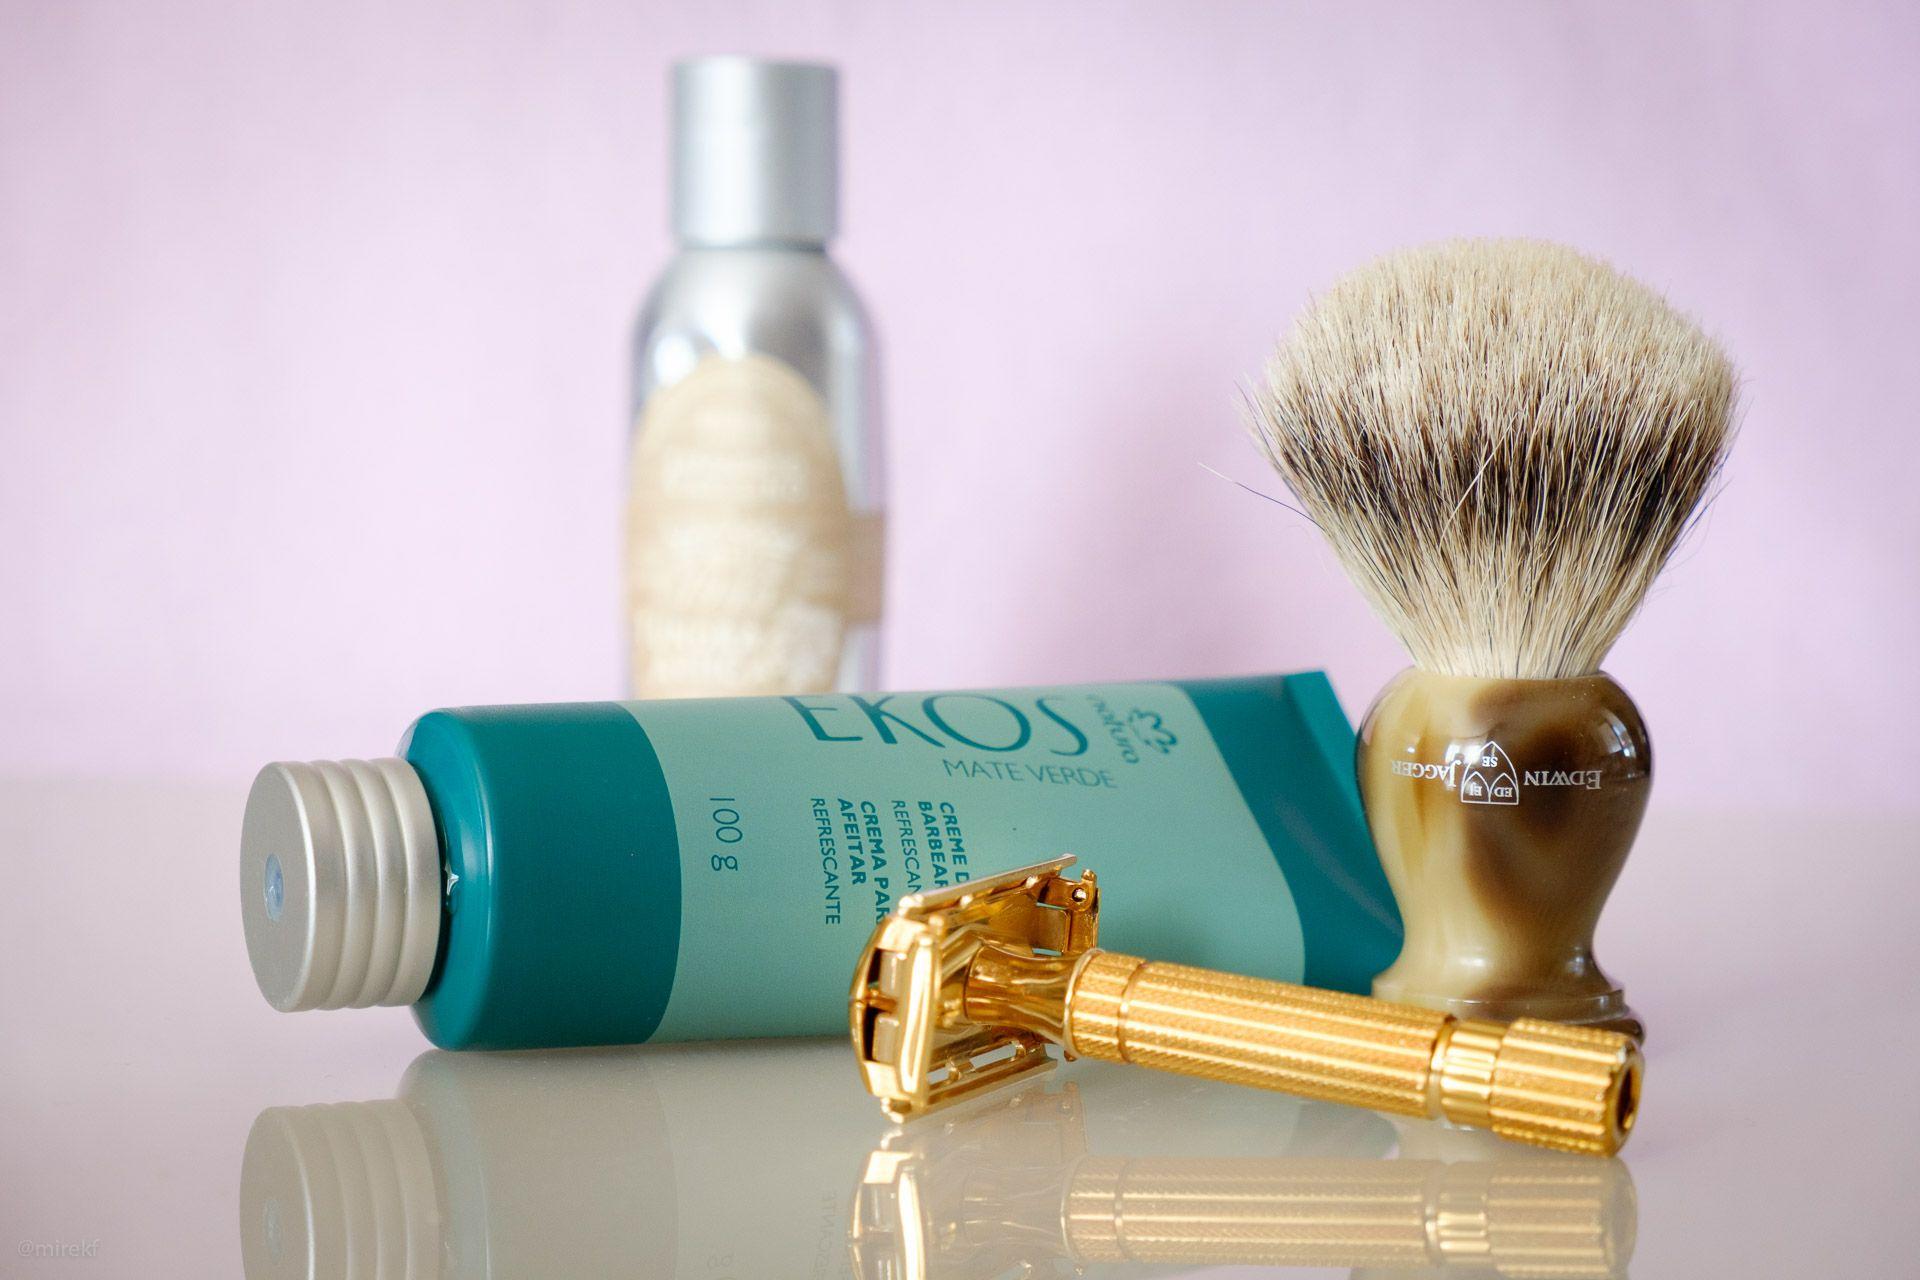 natura-ekos-mate-verde-shaving-cream-scenka1